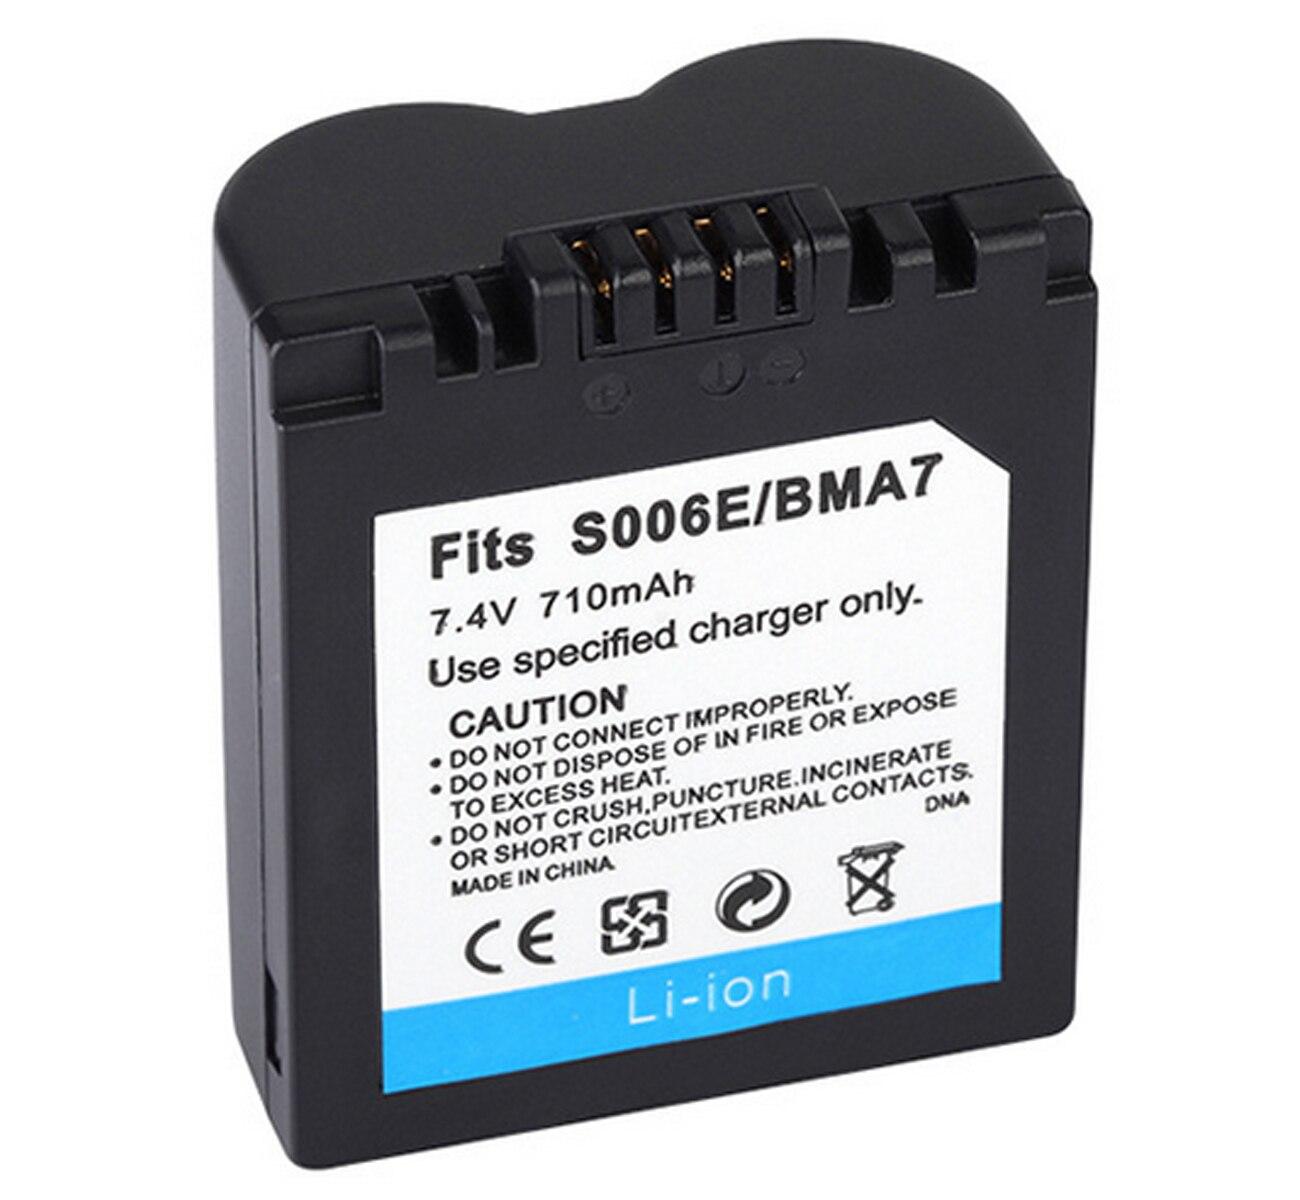 Pack de batería para Panasonic Lumix DMC-FZ7, DMC-FZ8, DMC-FZ18, DMC-FZ28, DMC-FZ30, DMC-FZ35, DMC-FZ38, DMC-FZ50, cámara Digital